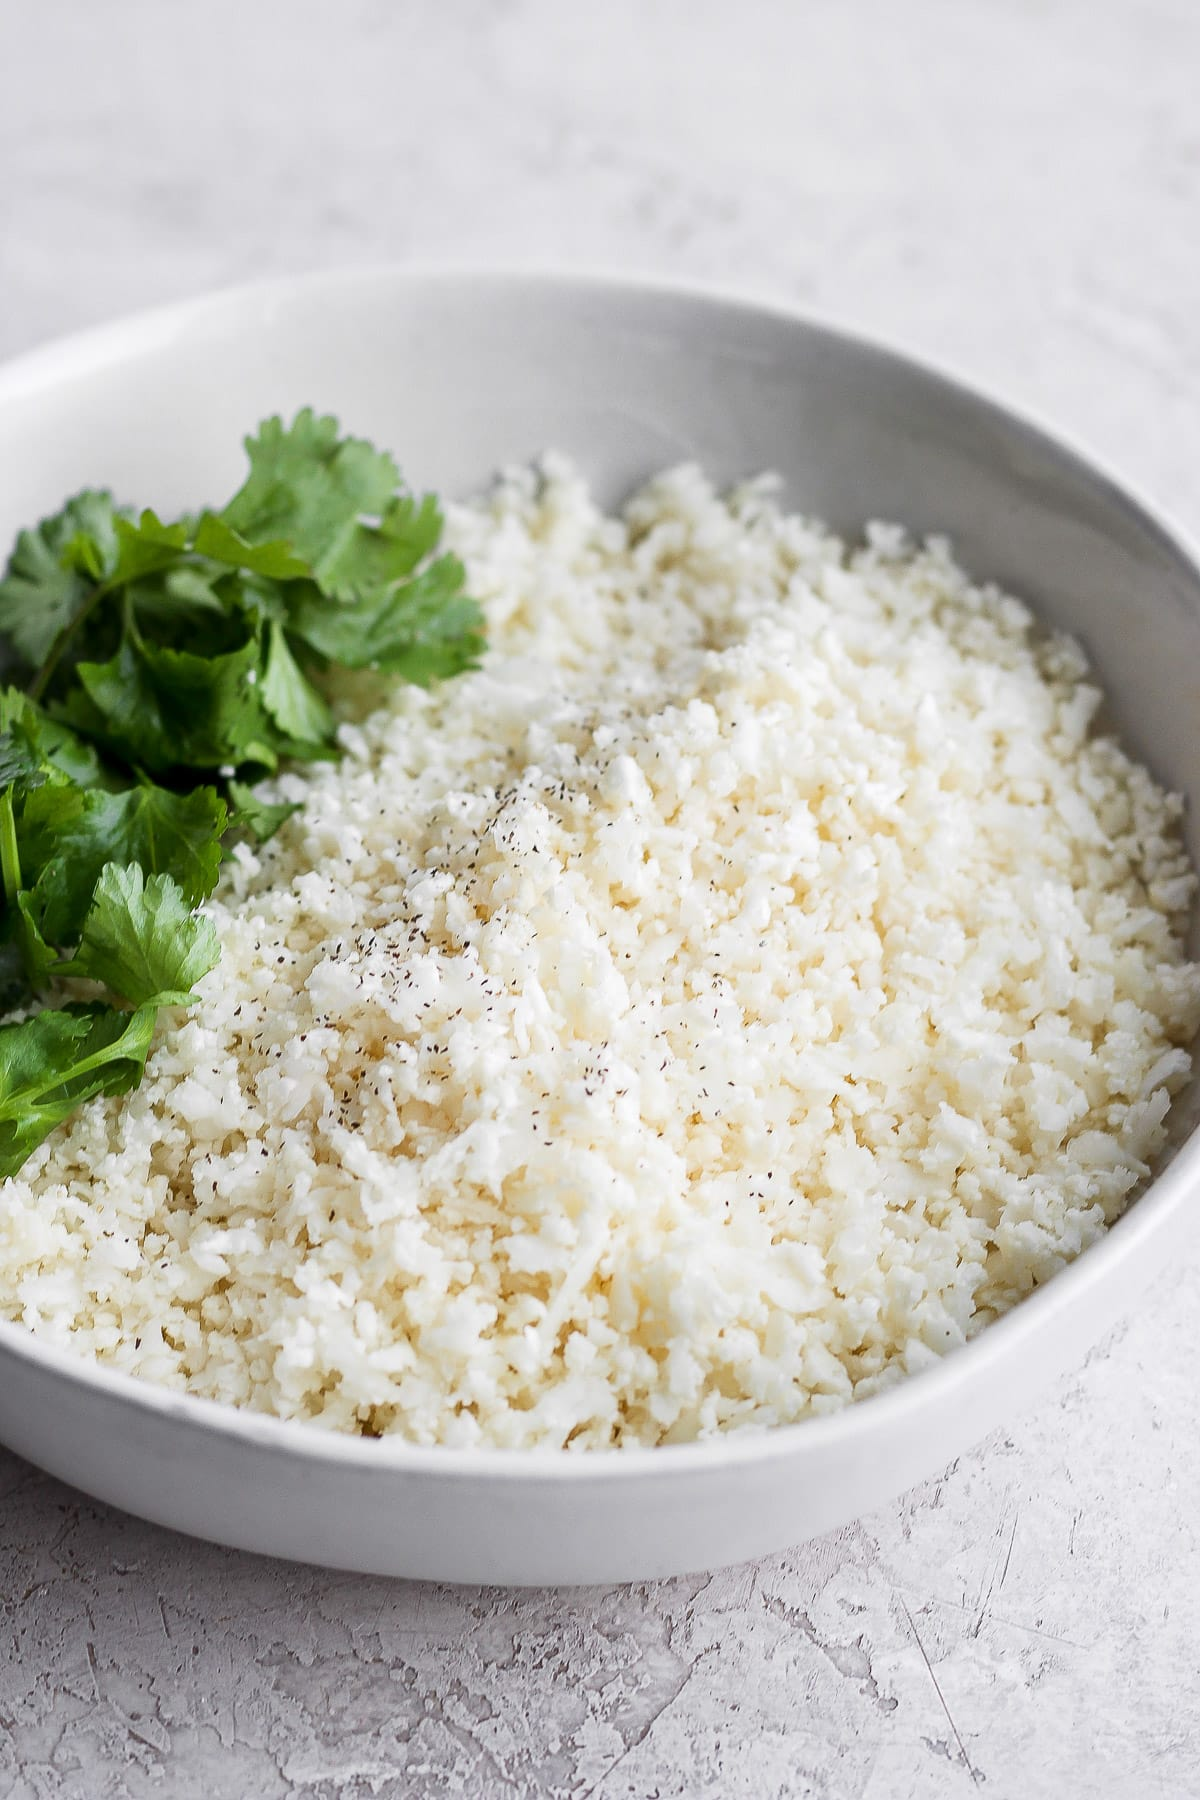 Cauliflower rice in a bowl with fresh cilantro.